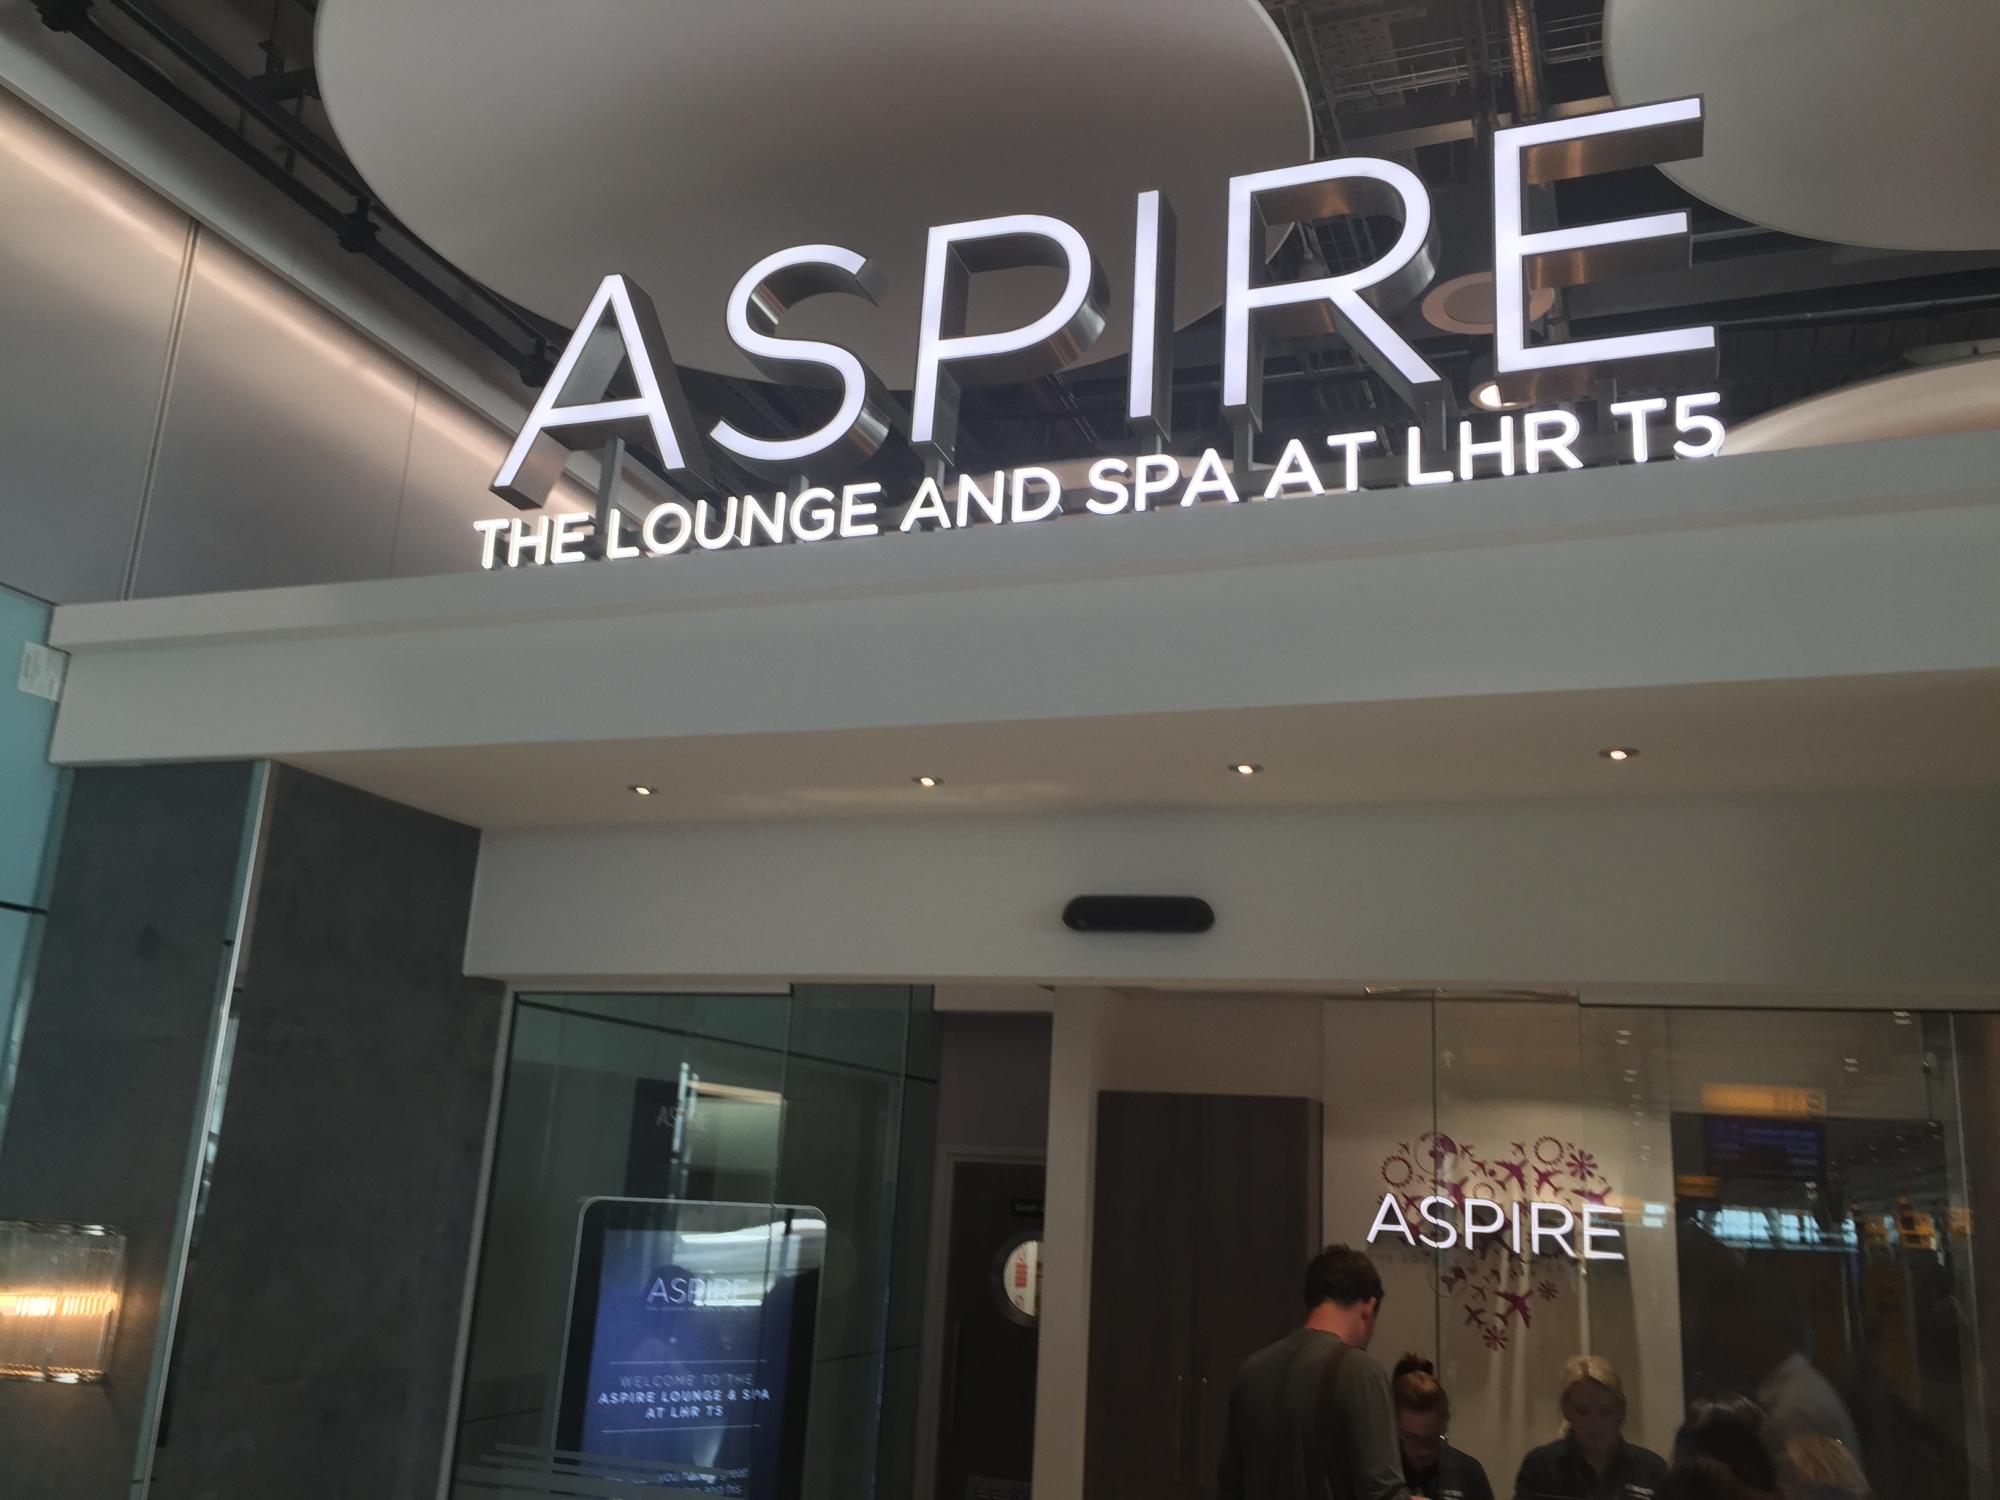 Heathrow T5 Aspire Lounge